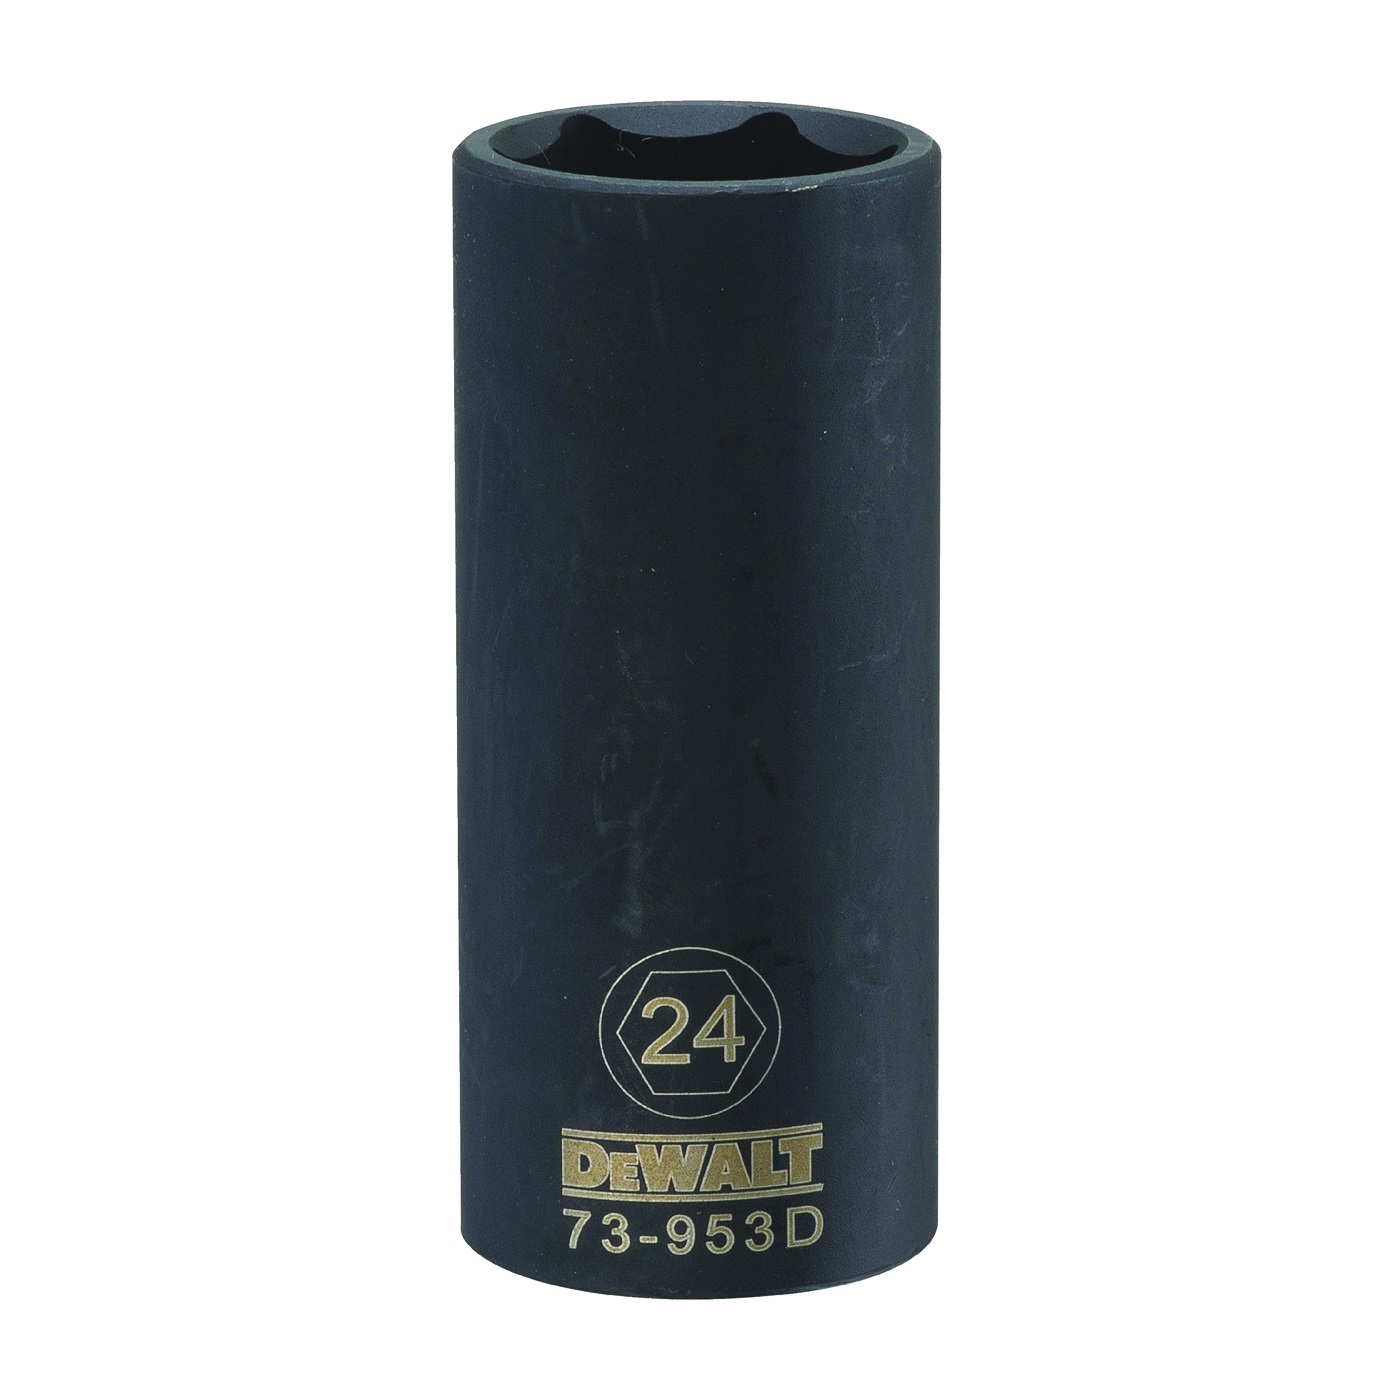 Picture of DeWALT DWMT73953OSP Impact Socket, 24 mm Socket, 1/2 in Drive, 6 -Point, CR-440 Steel, Black Oxide